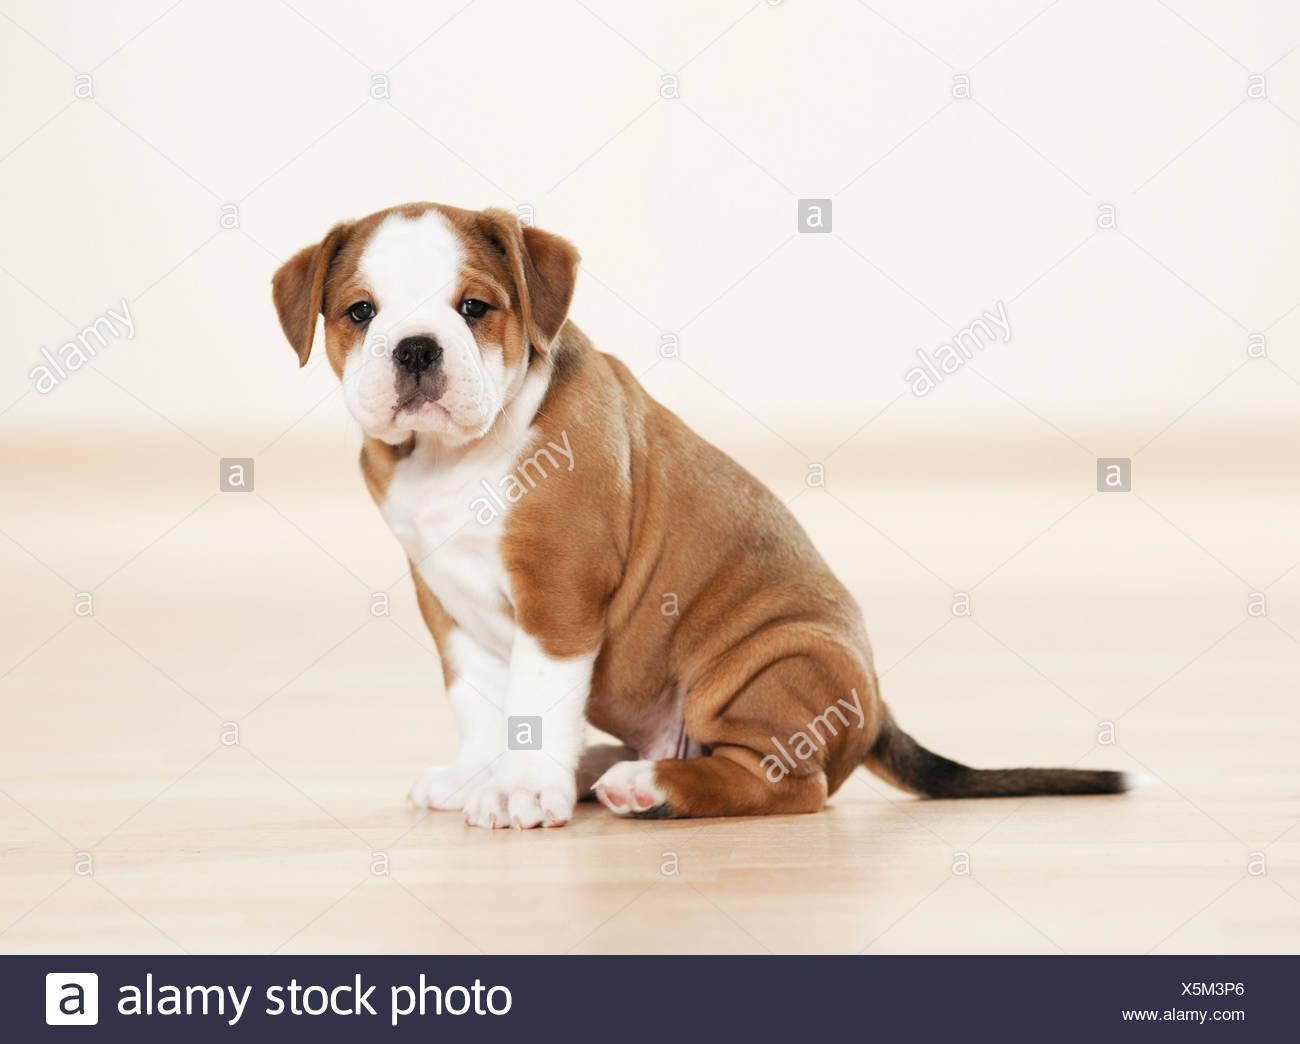 Continental Bulldog Puppy Sitting Cut Out Stock Photo Alamy